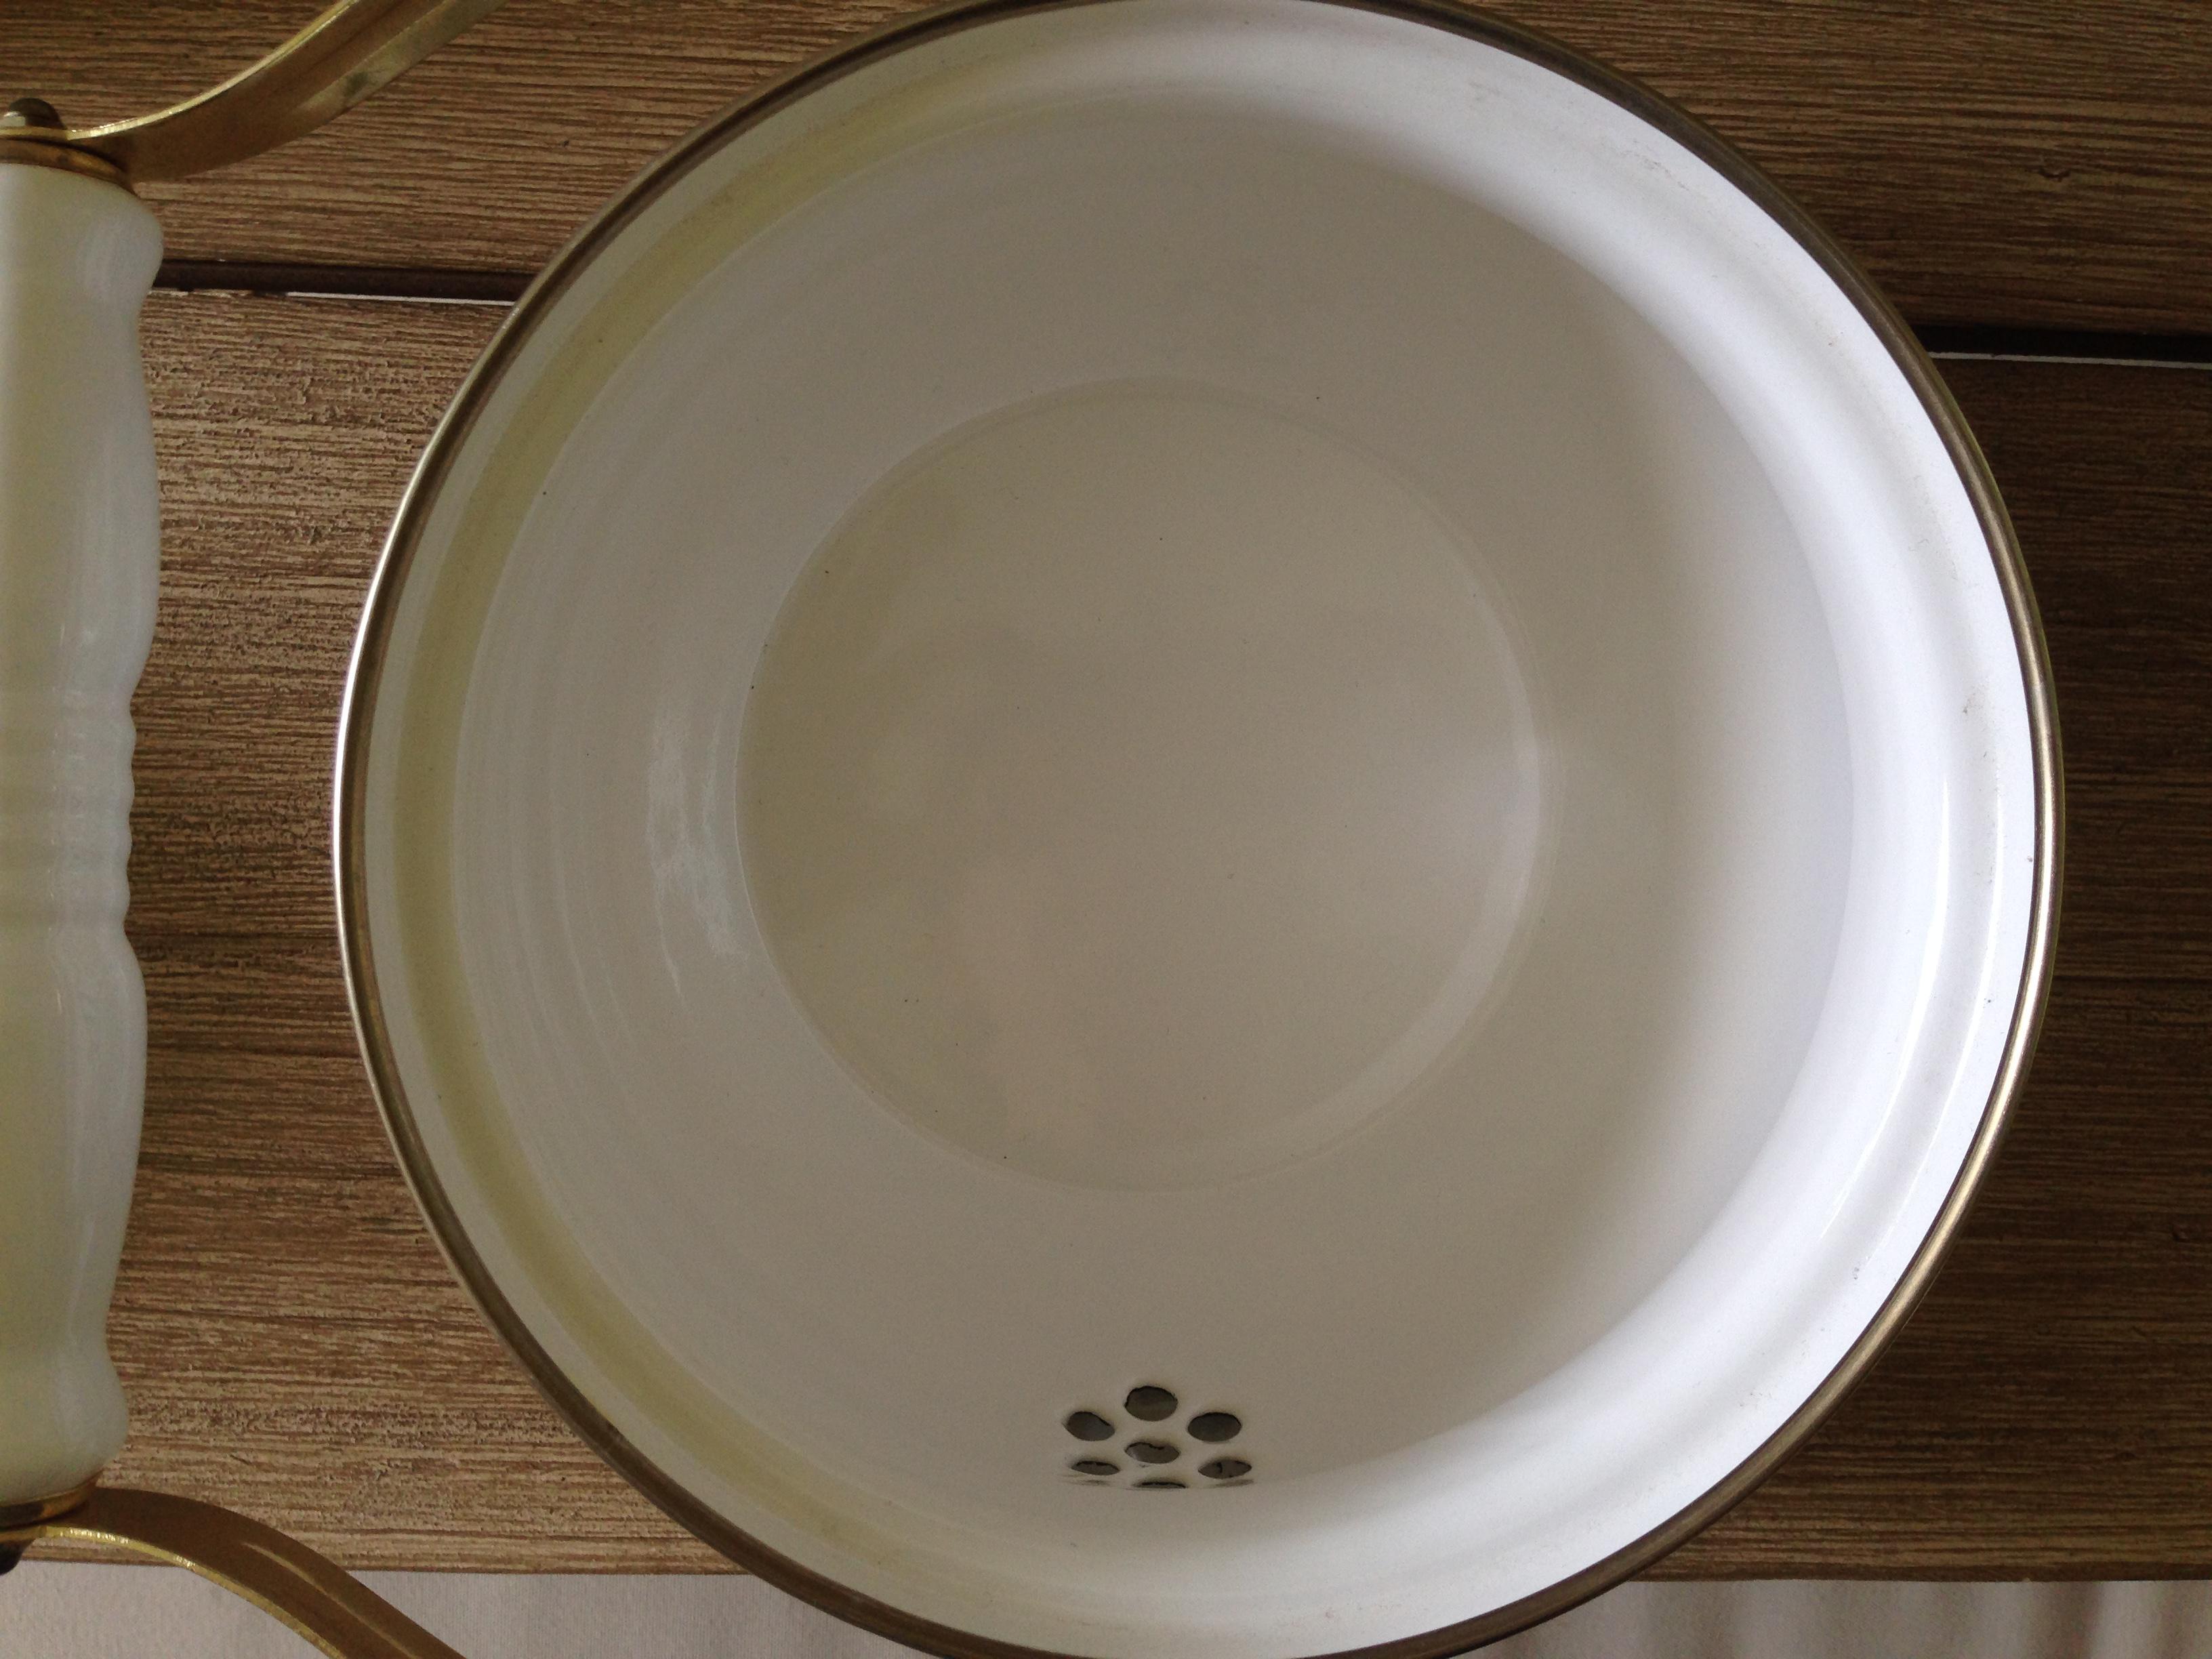 Toile Tabletop Unltd. New England Black Toile (Gamebirds) Tea Kettle - Image 10  sc 1 st  Chairish & Toile Tabletop Unltd. New England Black Toile (Gamebirds) Tea Kettle ...